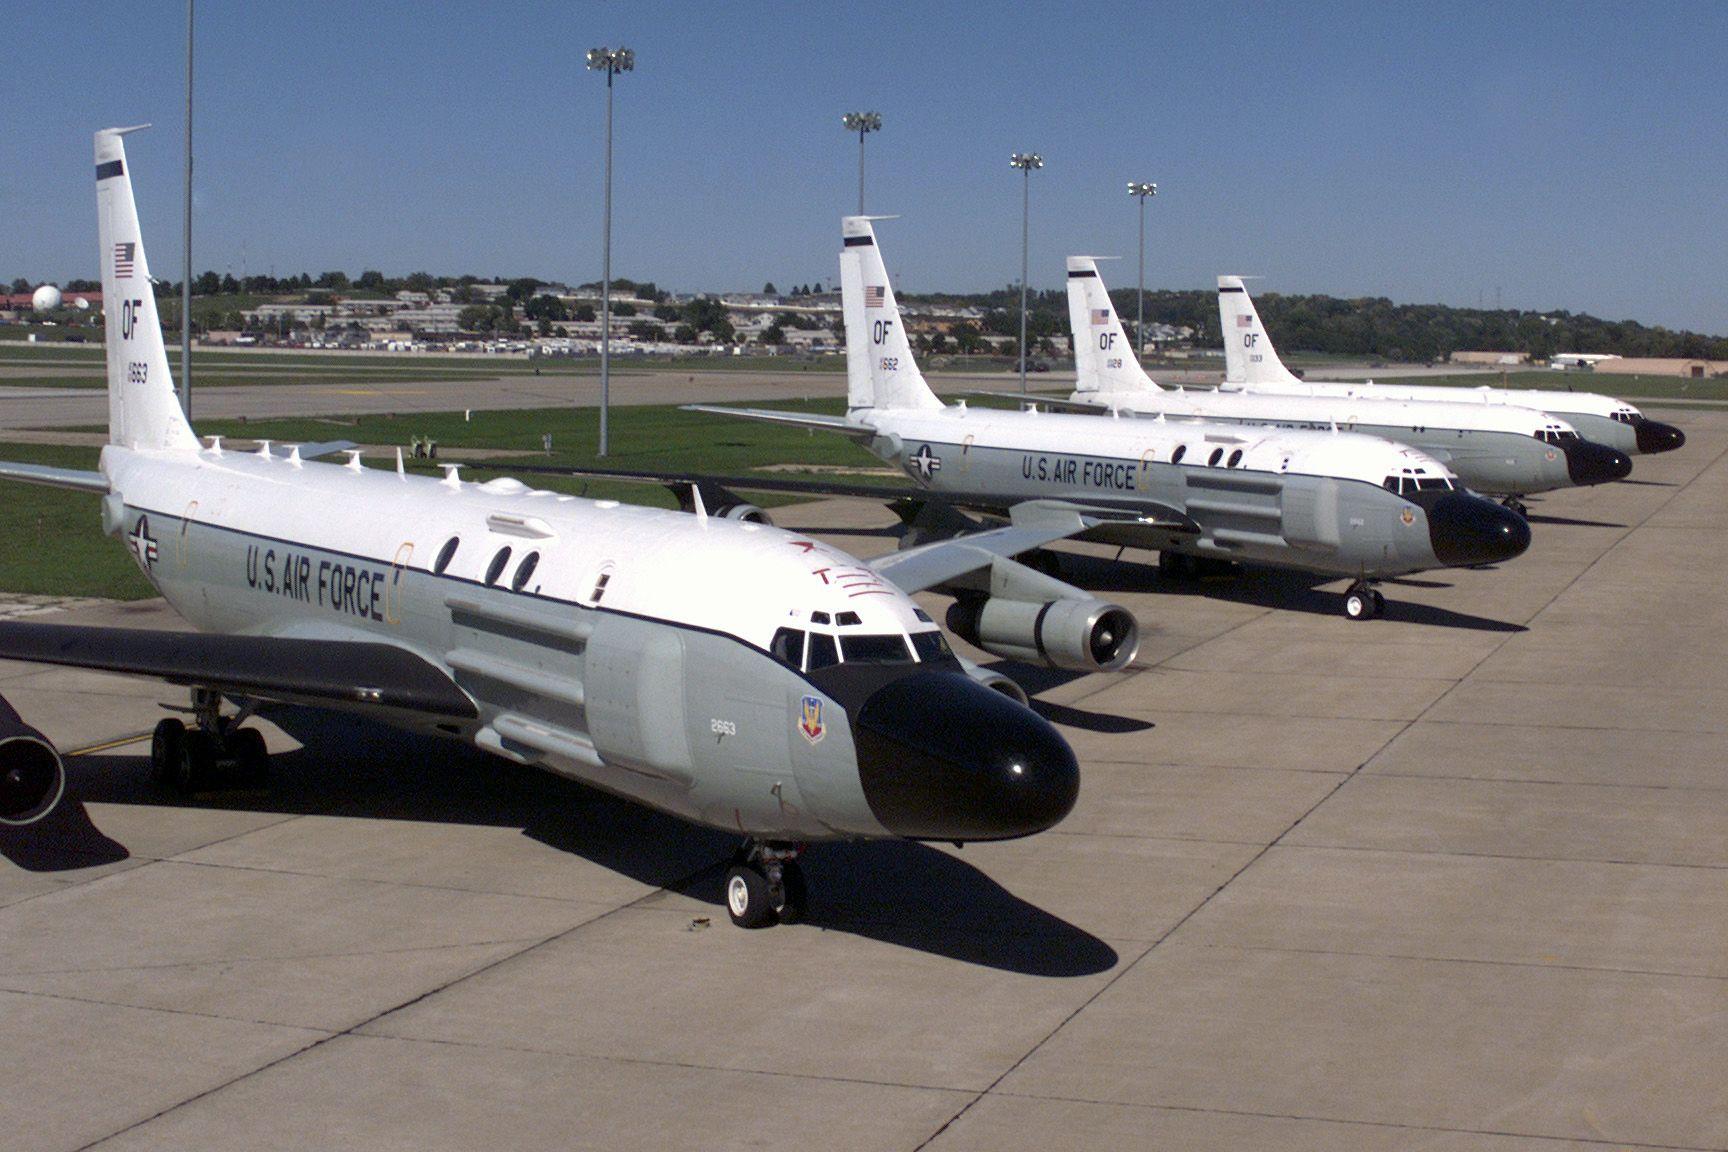 RC-135, автор: aeroman3 [my_public_domain_photos], лицензия: CC0 1.0